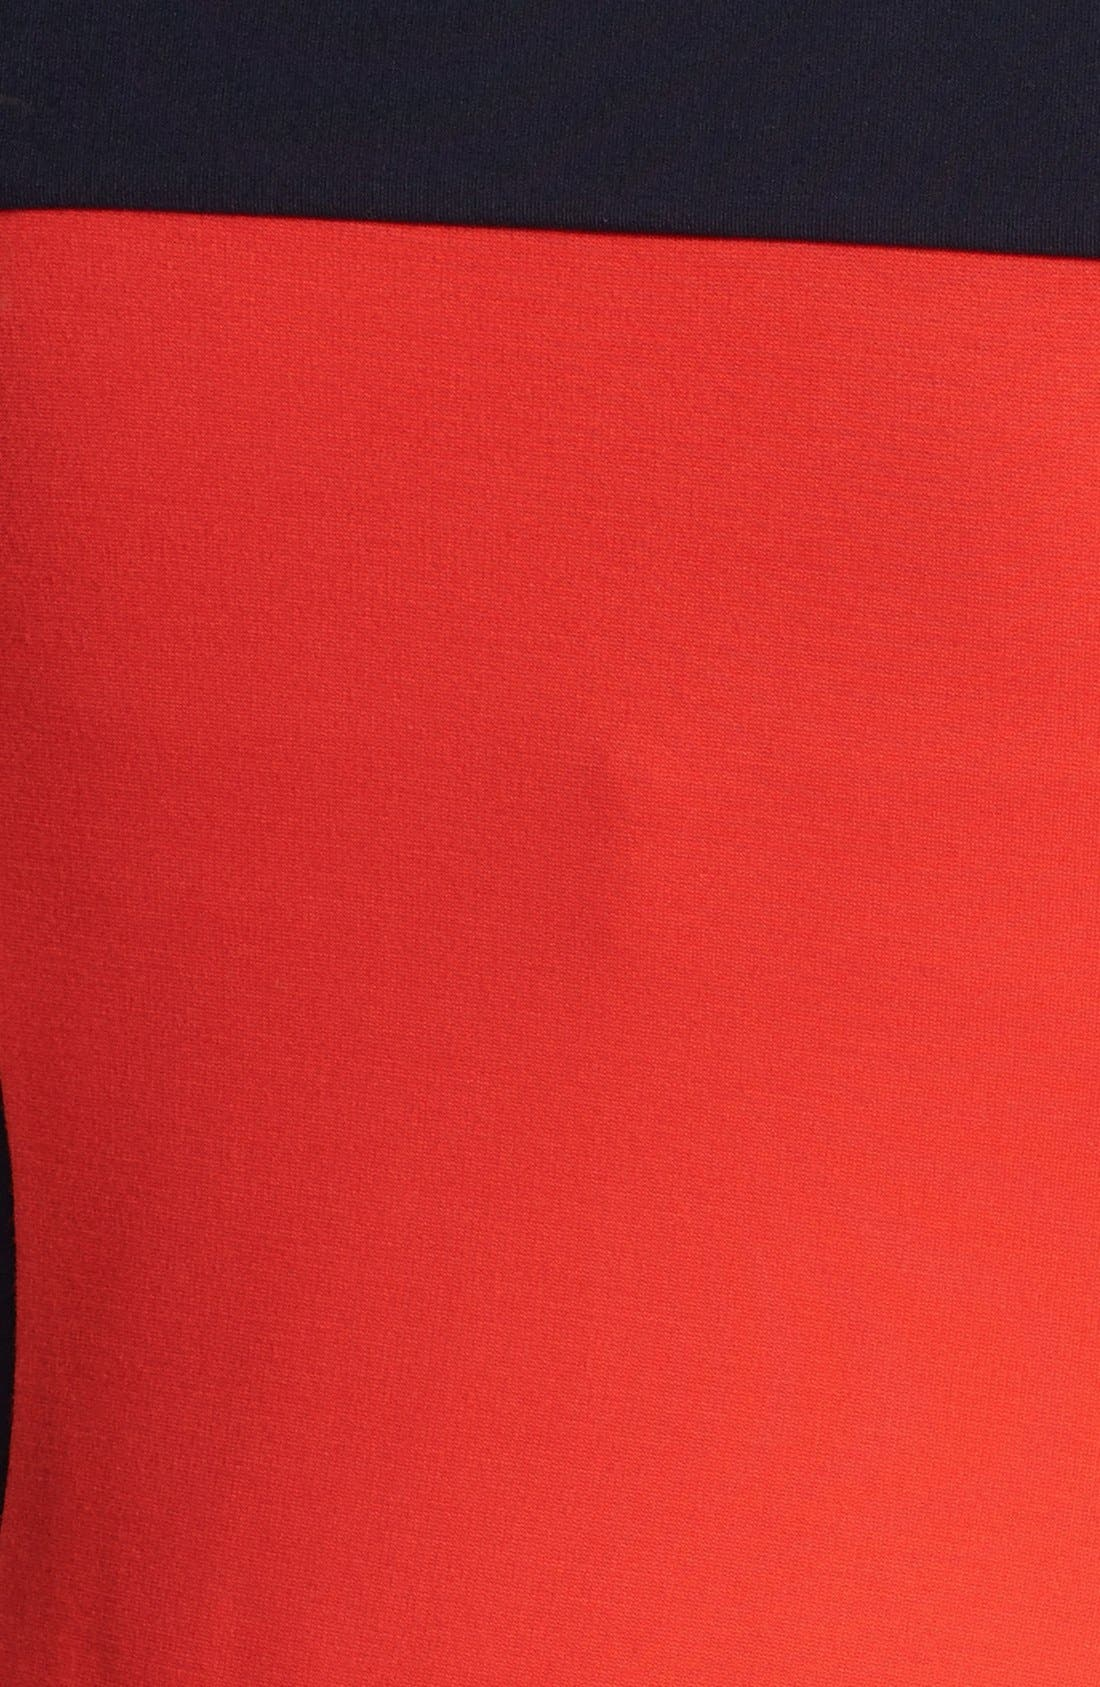 Alternate Image 3  - BOSS HUGO BOSS Colorblock Jersey Dress